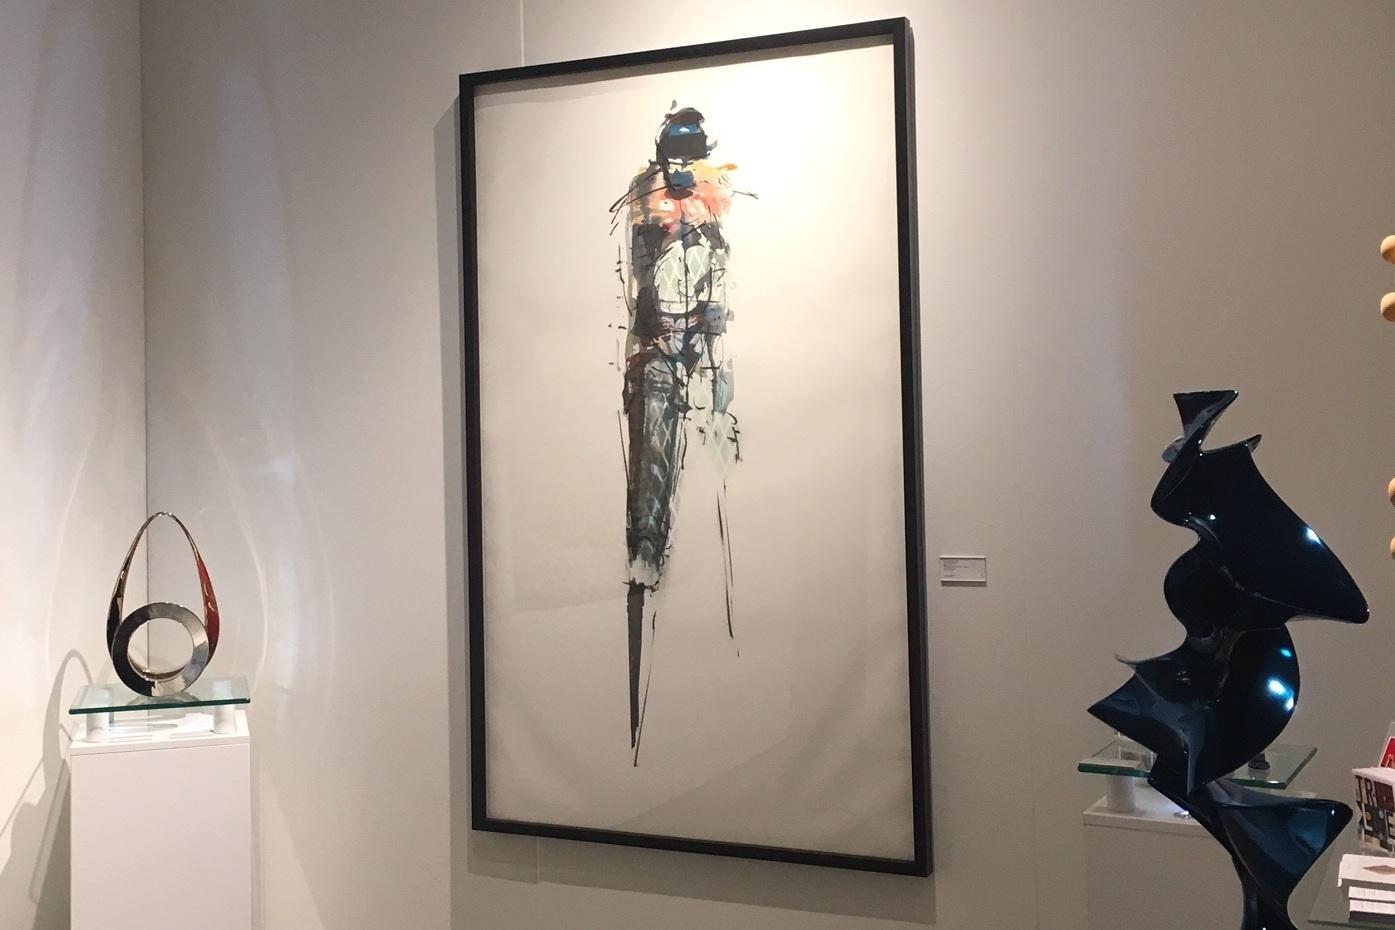 install photo at seattle art fair featuring jason myers, tarik currimbhoy and syvlestre gauvrit's works